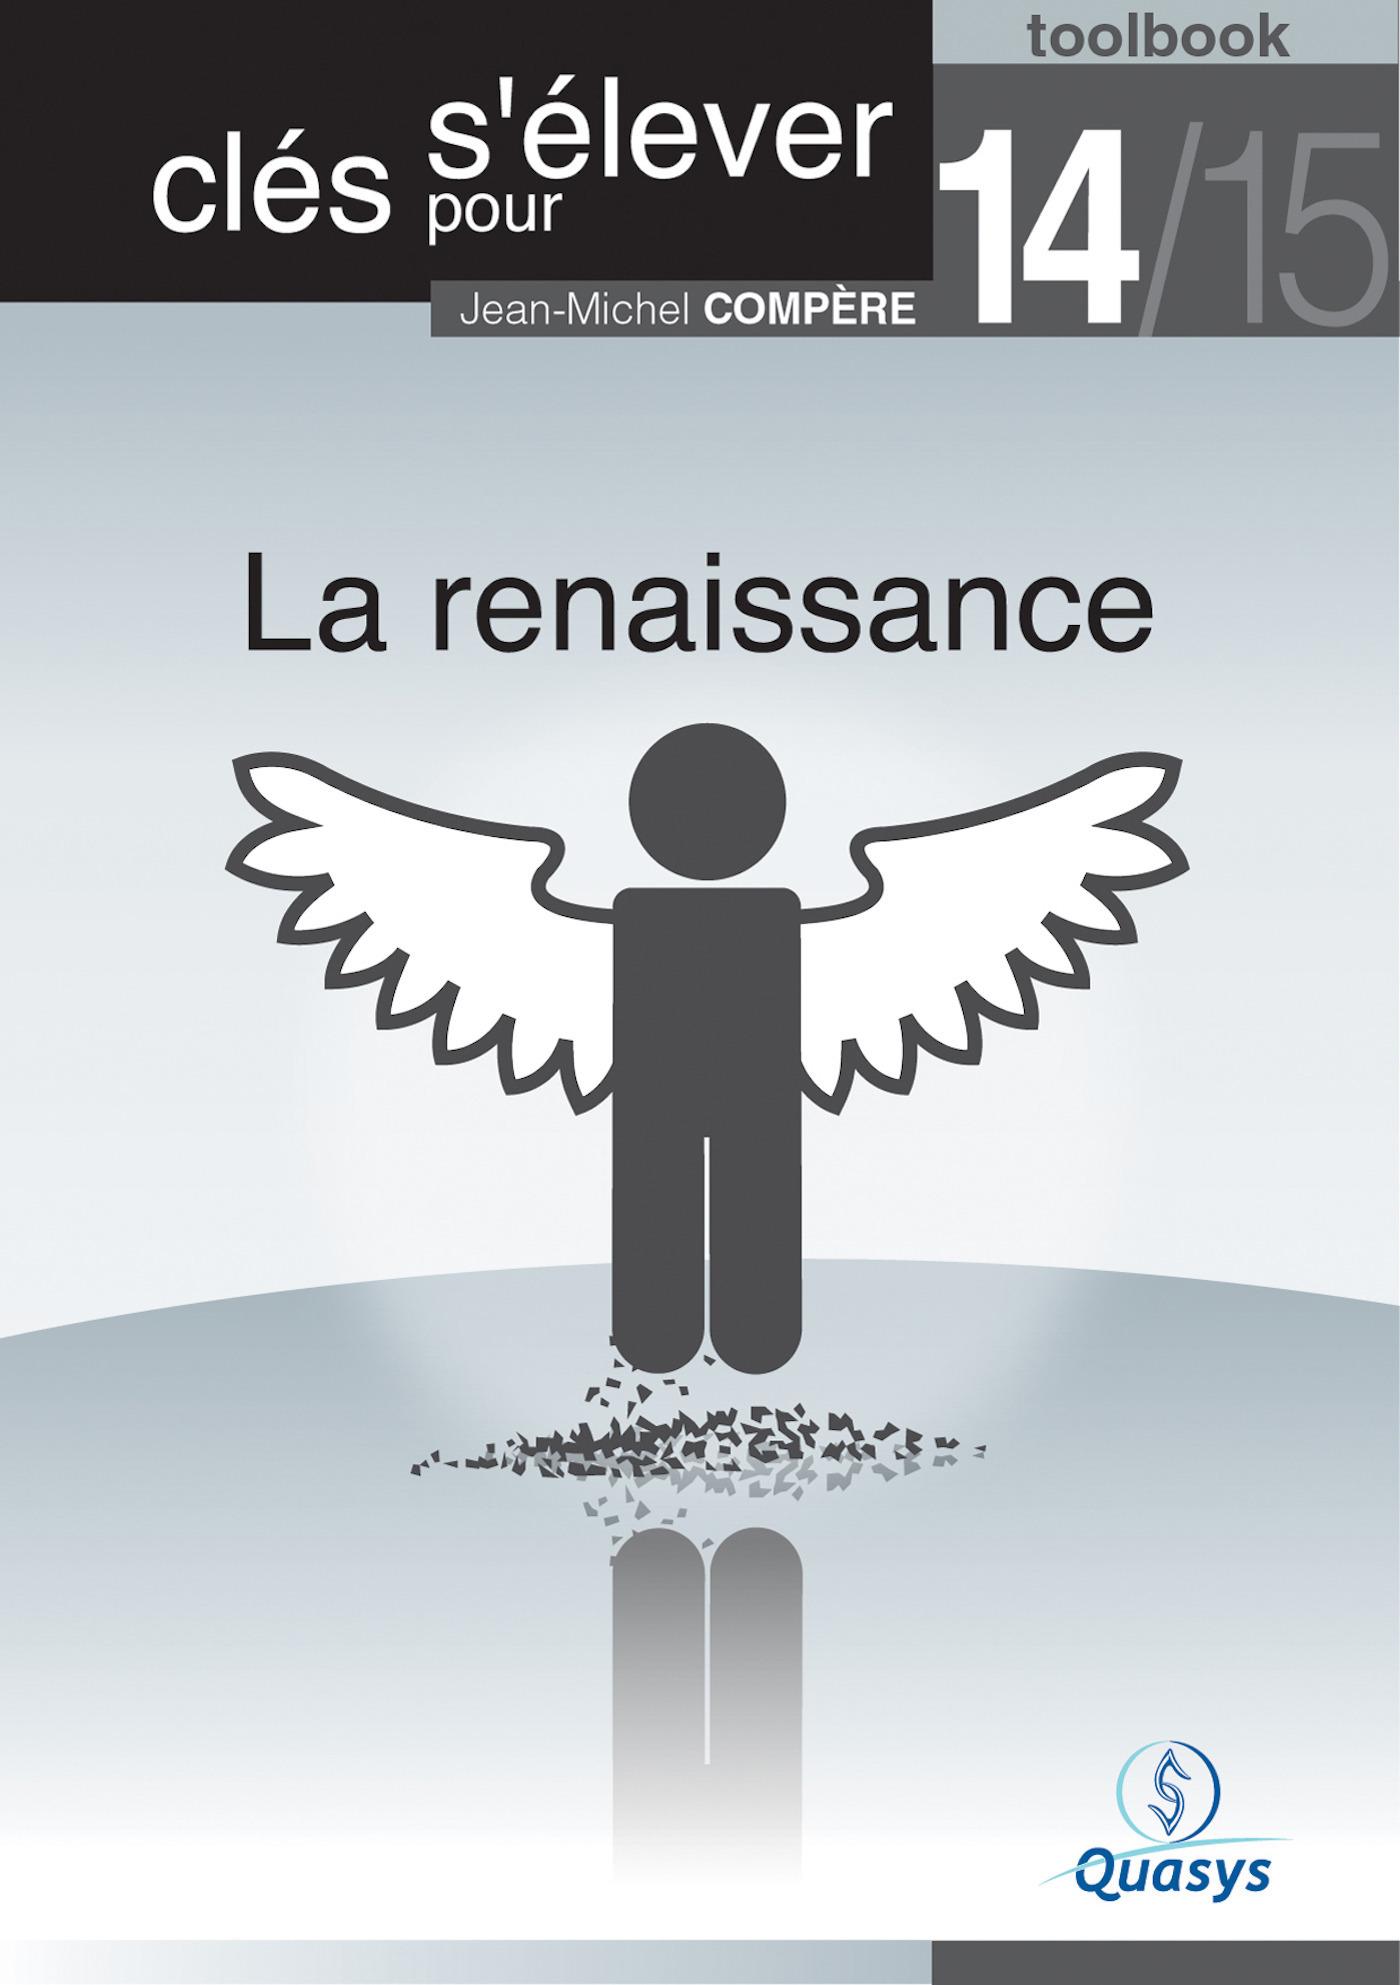 La renaissance (Toolbook 14/15